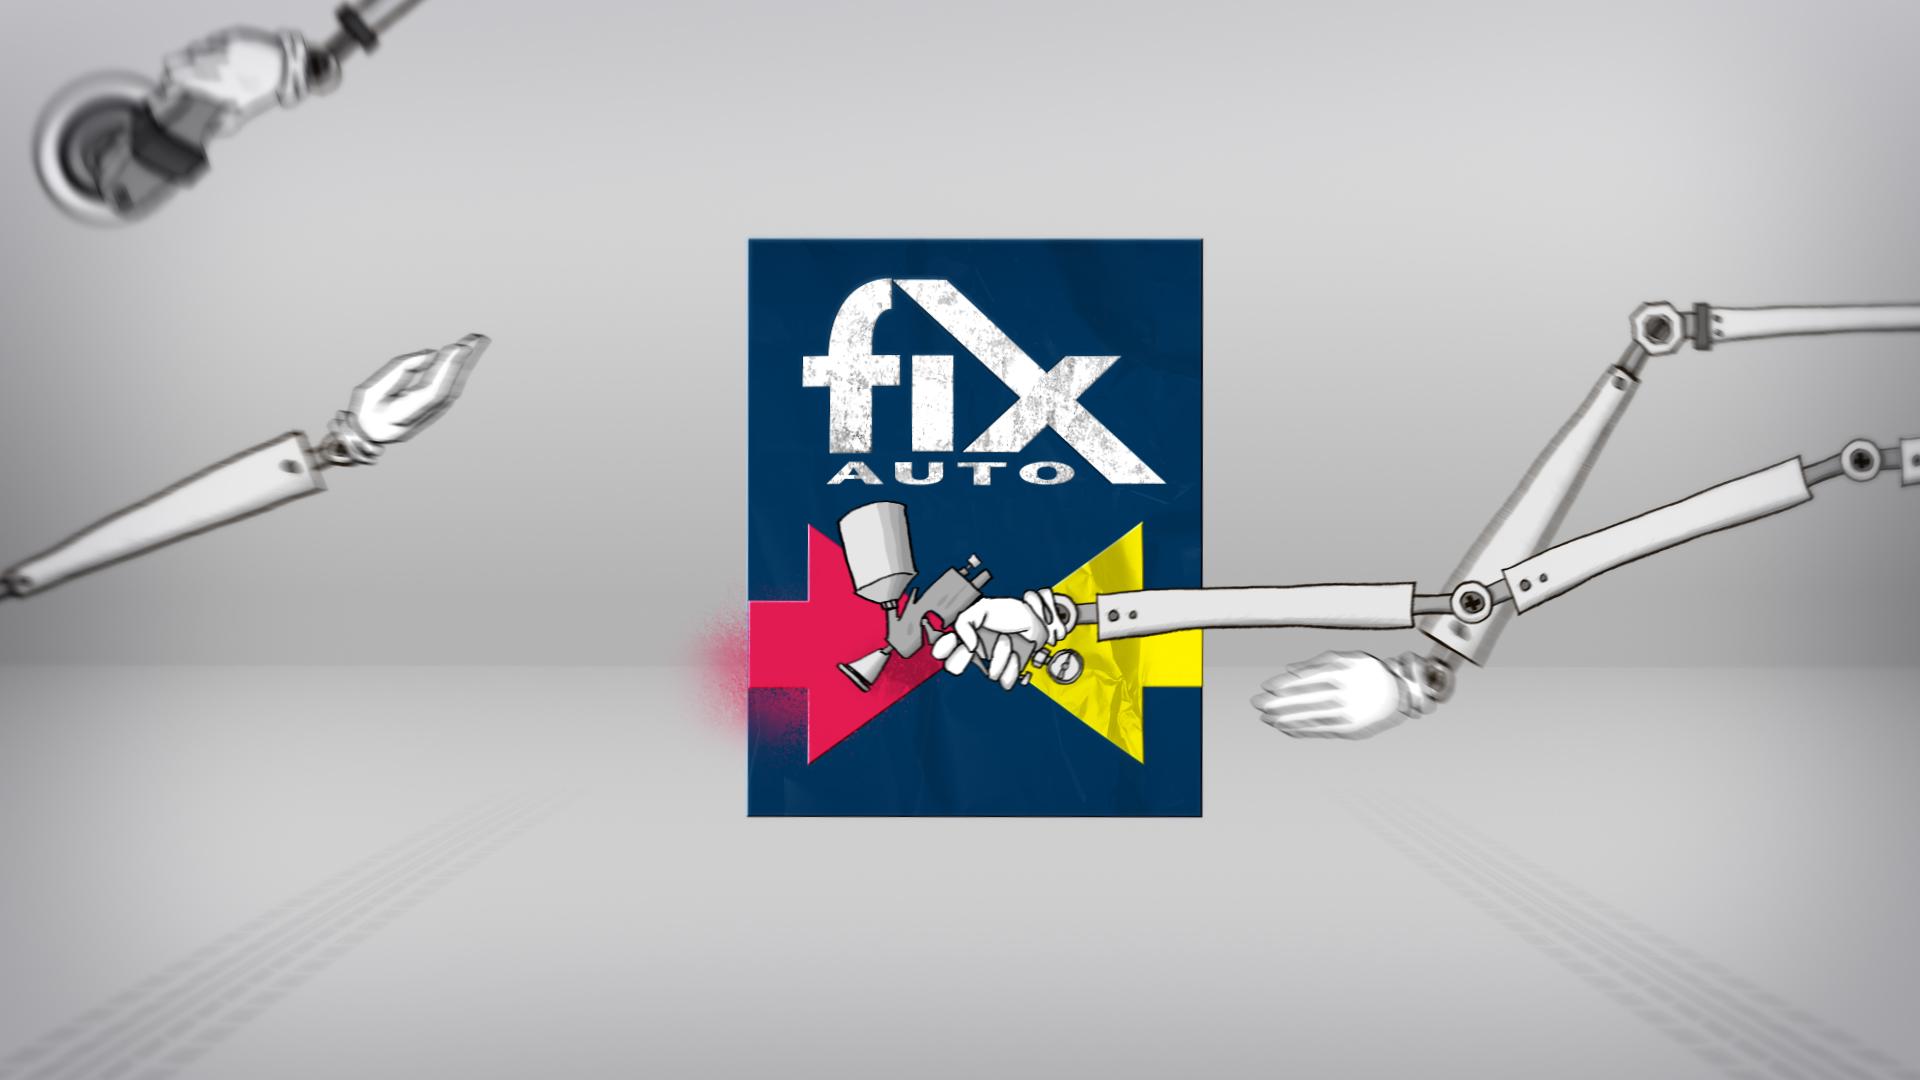 FIX_AUTO_tune_up_en_web_00267.jpg